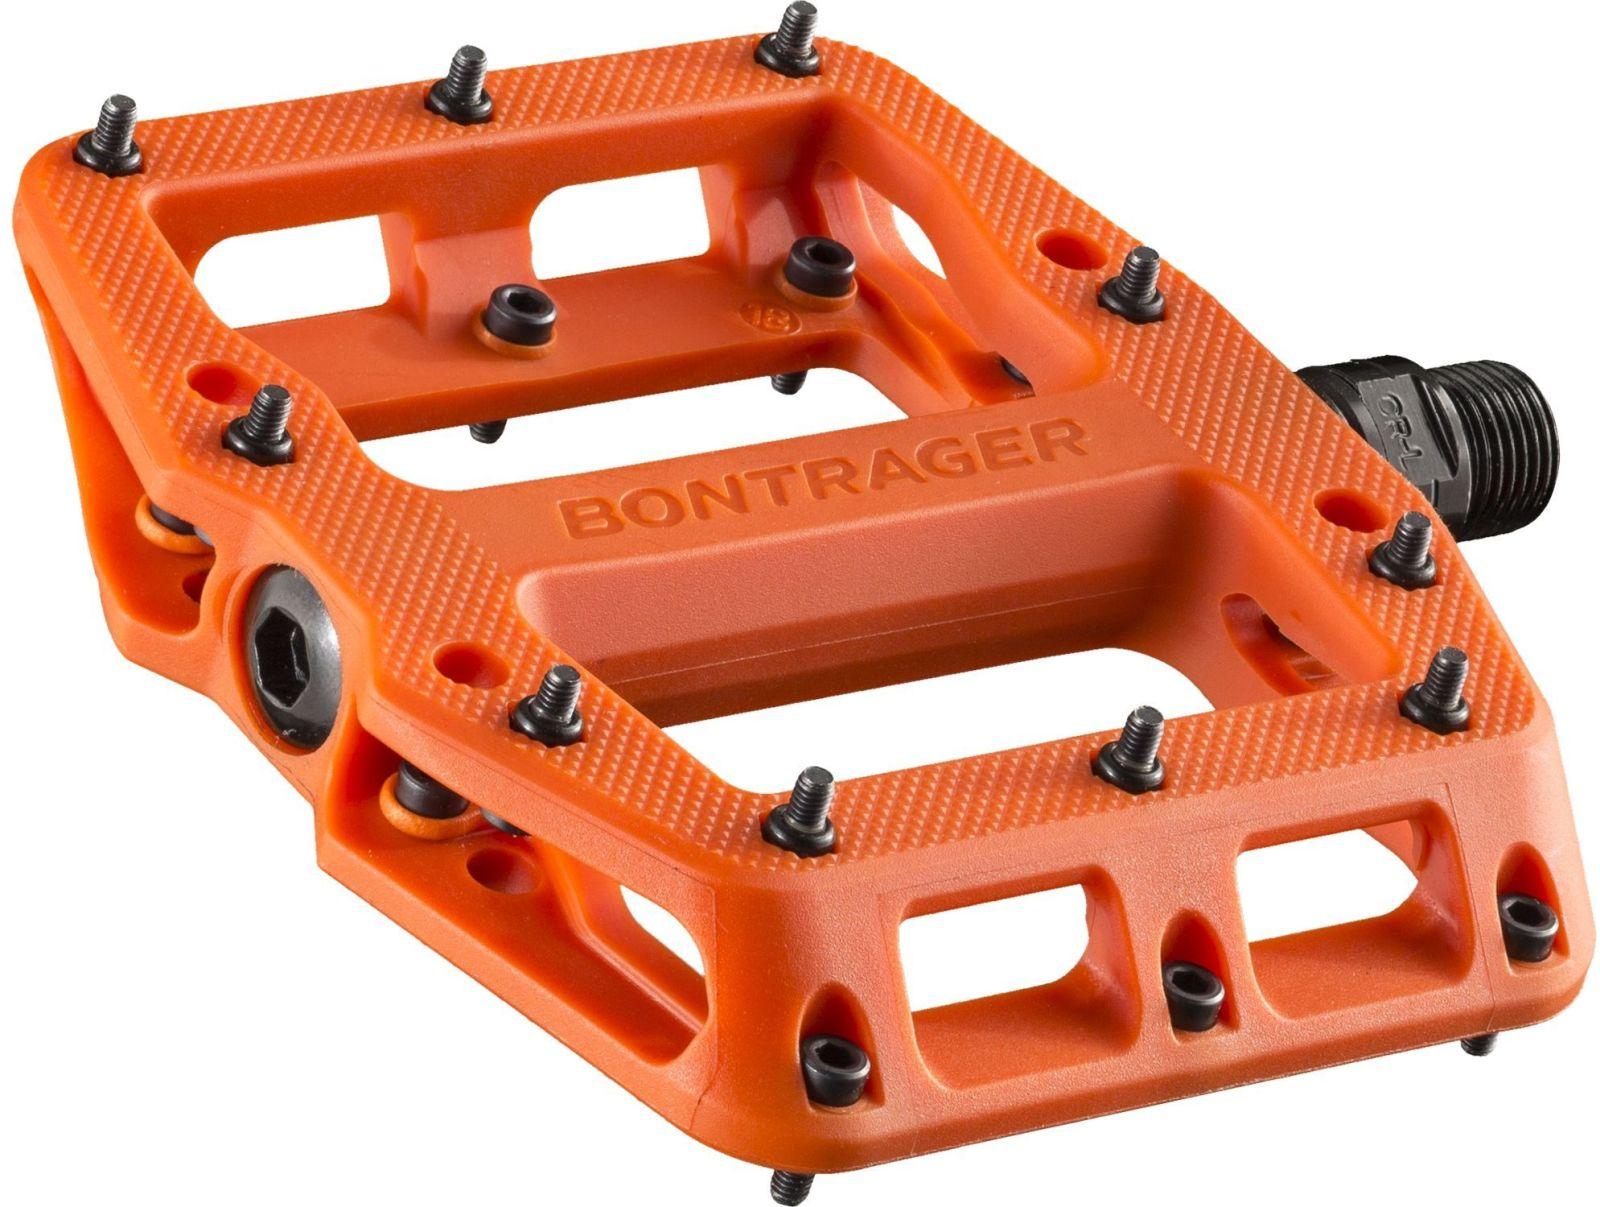 Bontrager Line Elite pedal - roarange uni